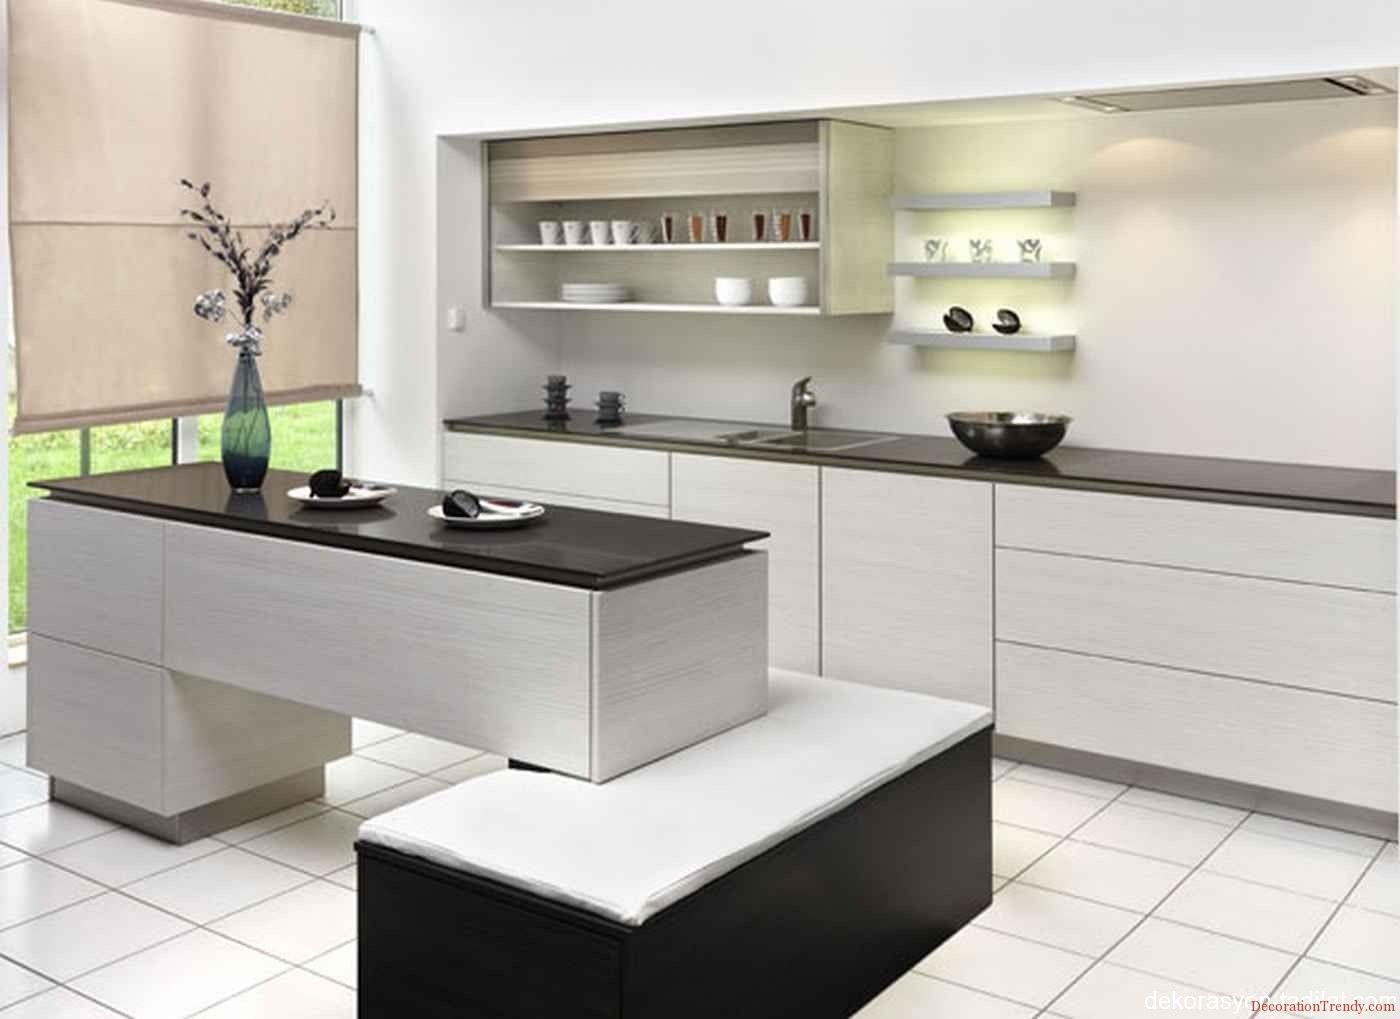 High Quality New Kitchen Design Ideas | Small Kitchen Design Ideas